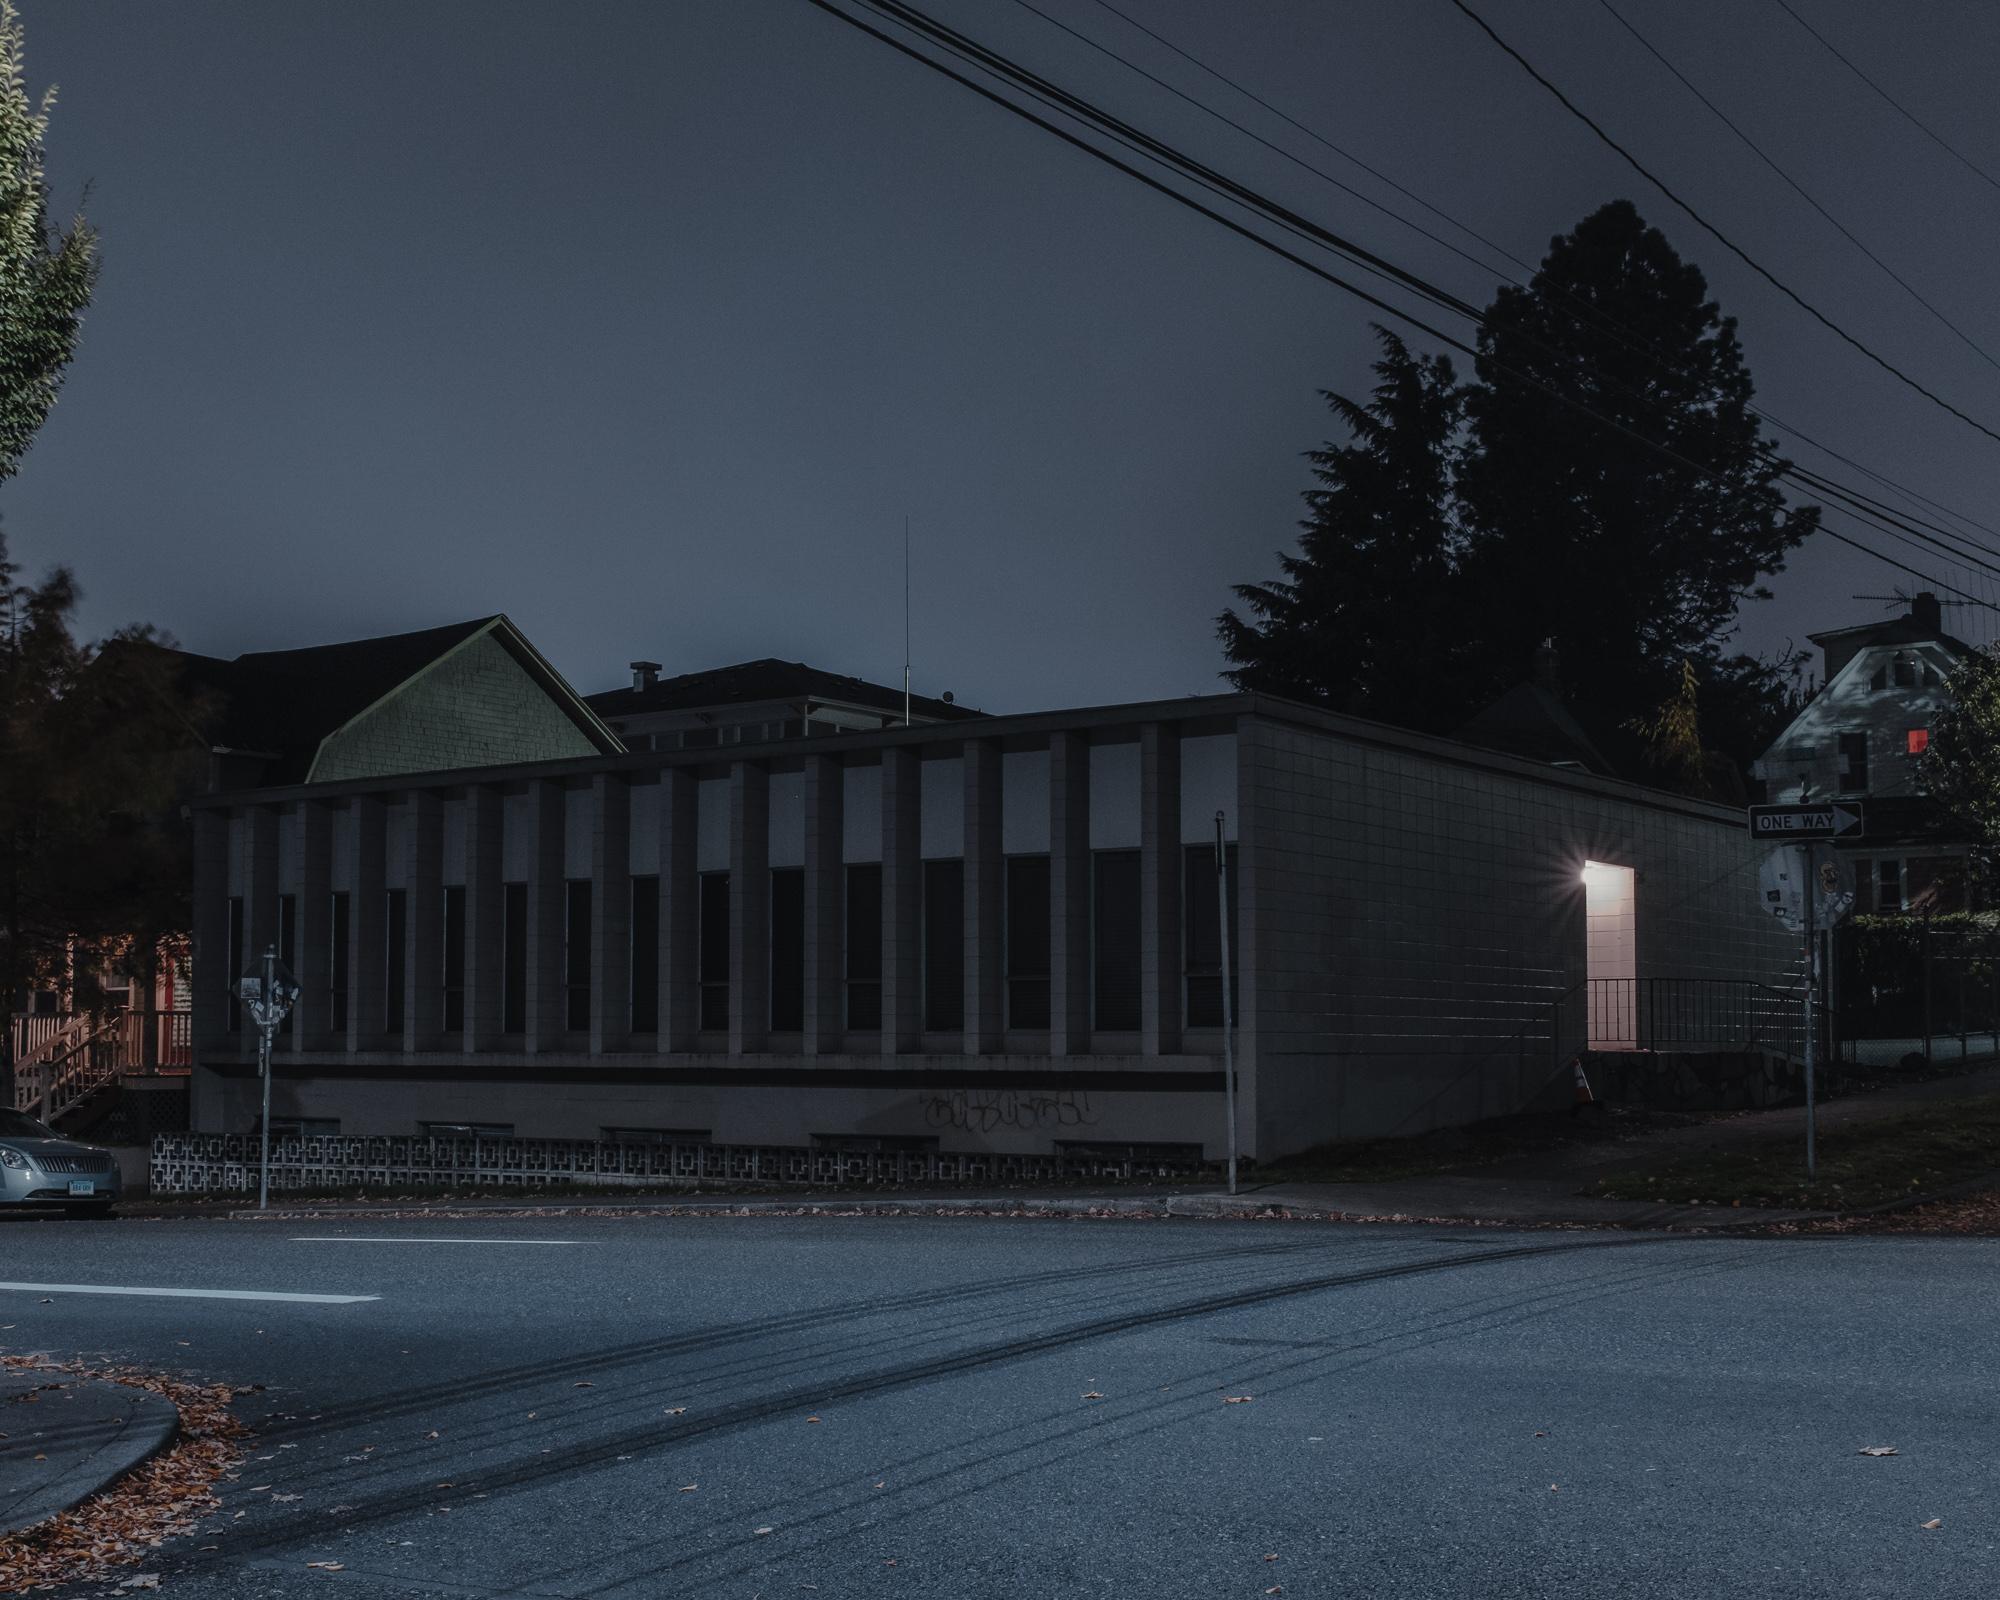 Nights-51.jpg